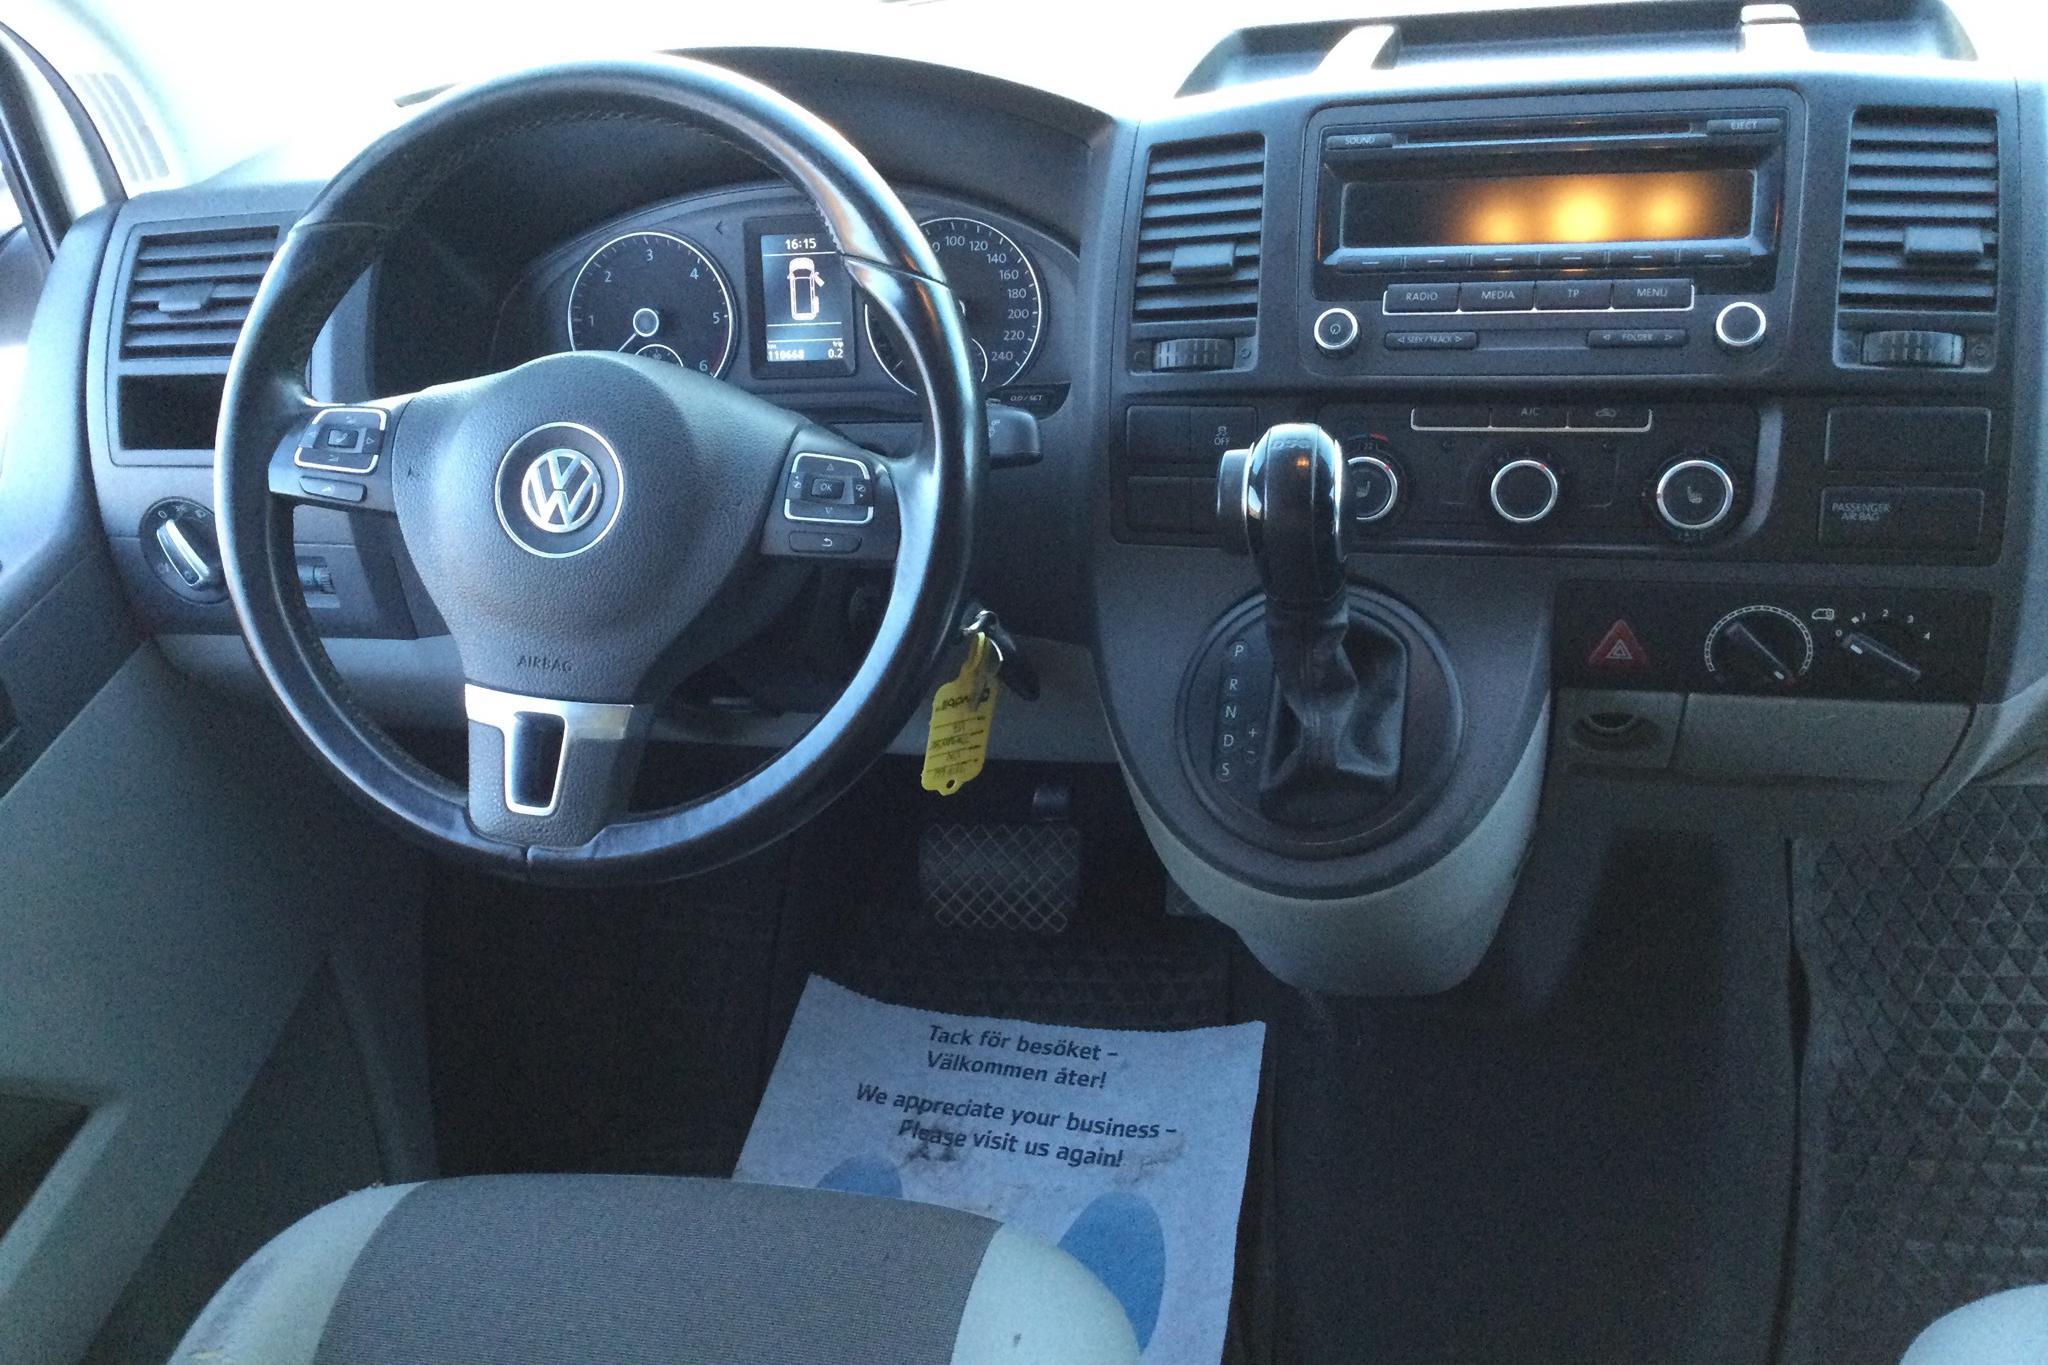 VW Transporter T5 2.0 TDI 4MOTION (180hk) - 110 670 km - Automatic - white - 2014